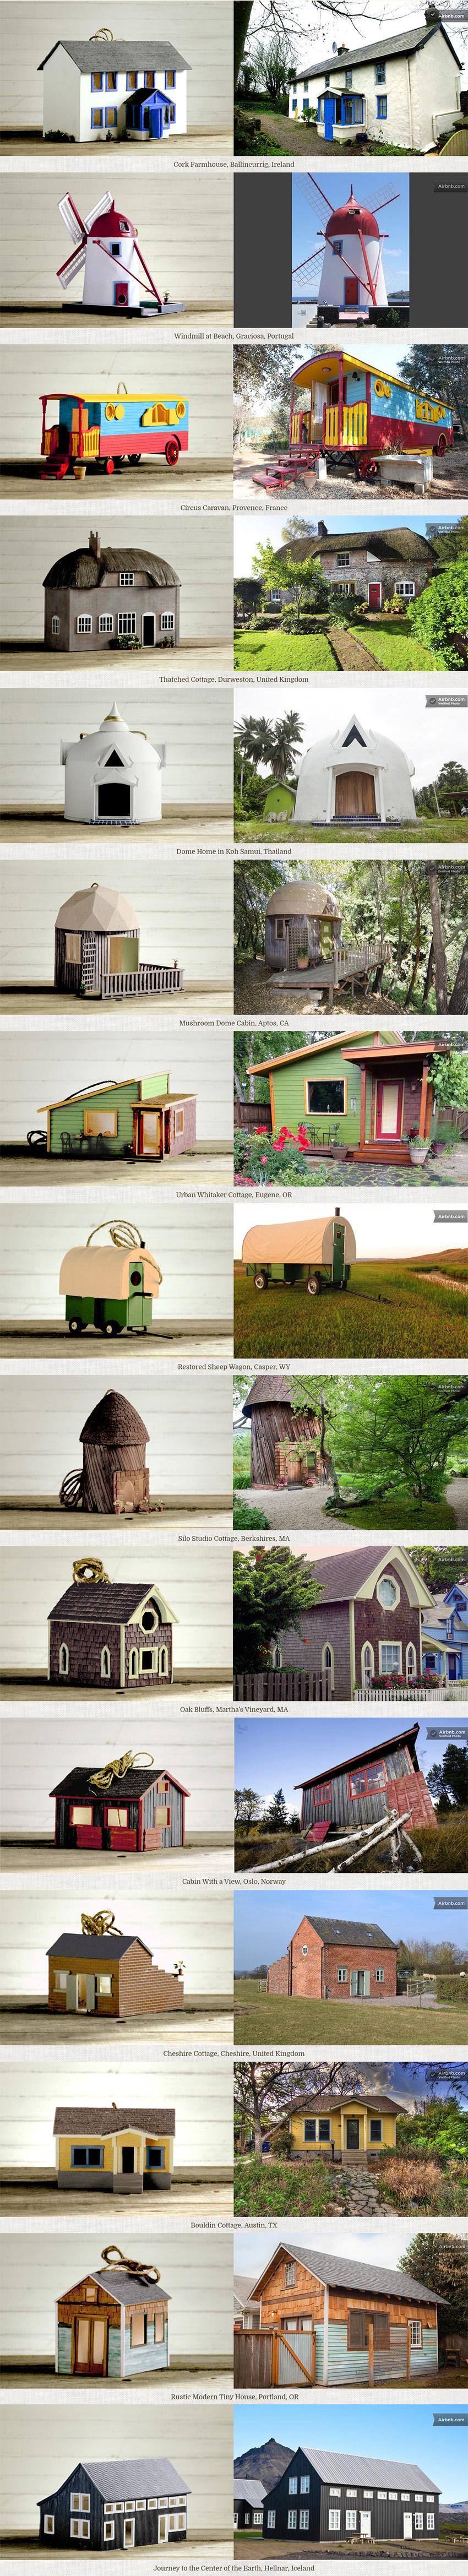 Houses_Strip_2_1200_1200.jpg